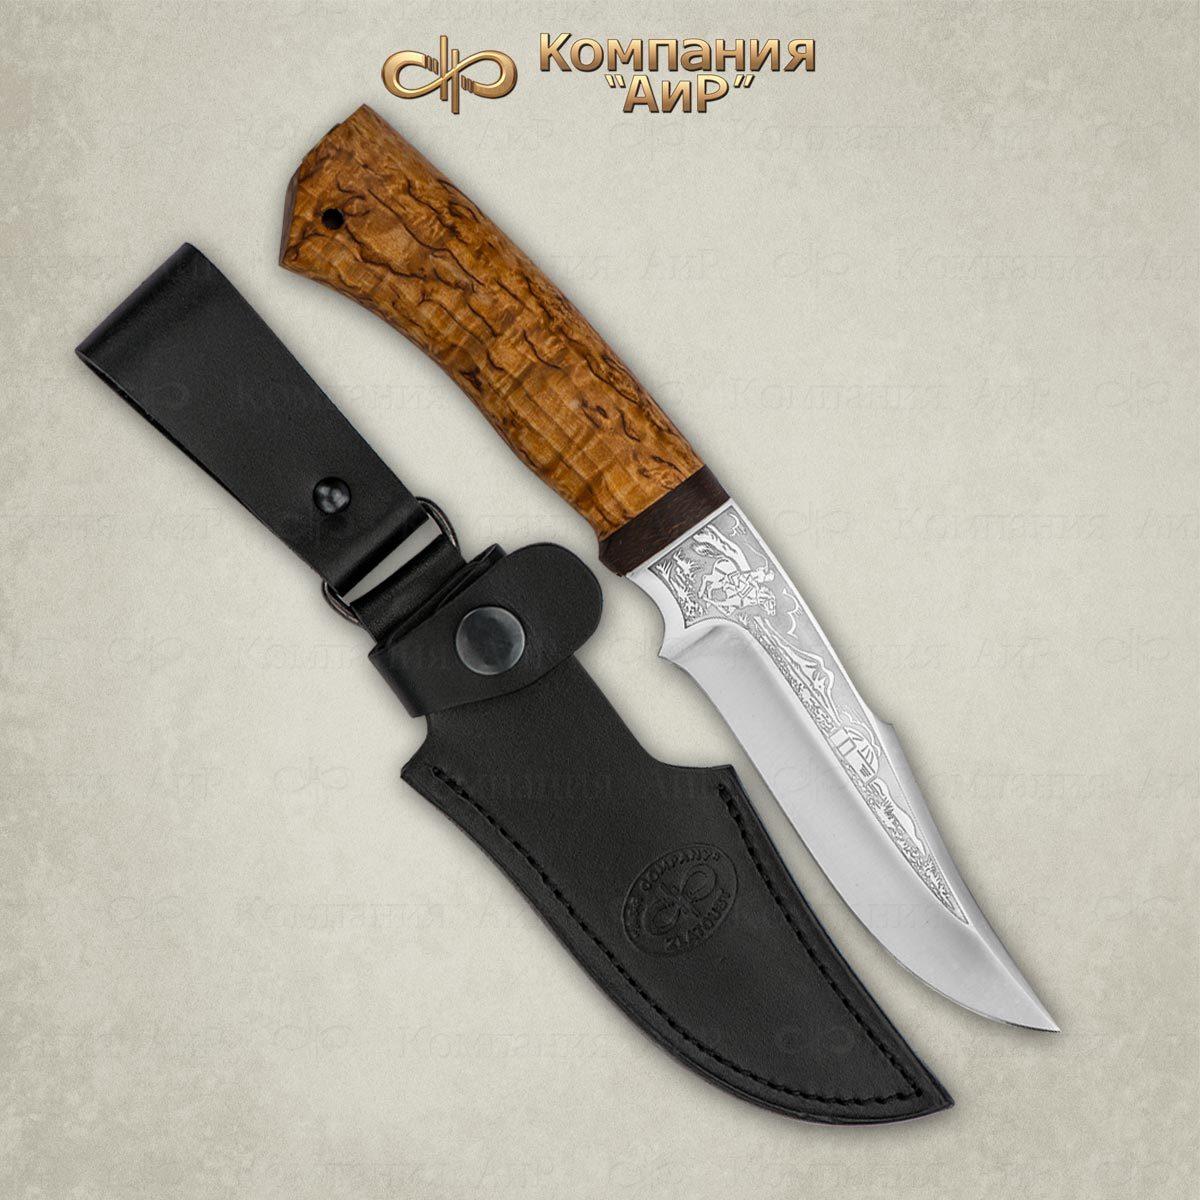 Нож АиР Хазар, сталь М390, рукоять карельская береза